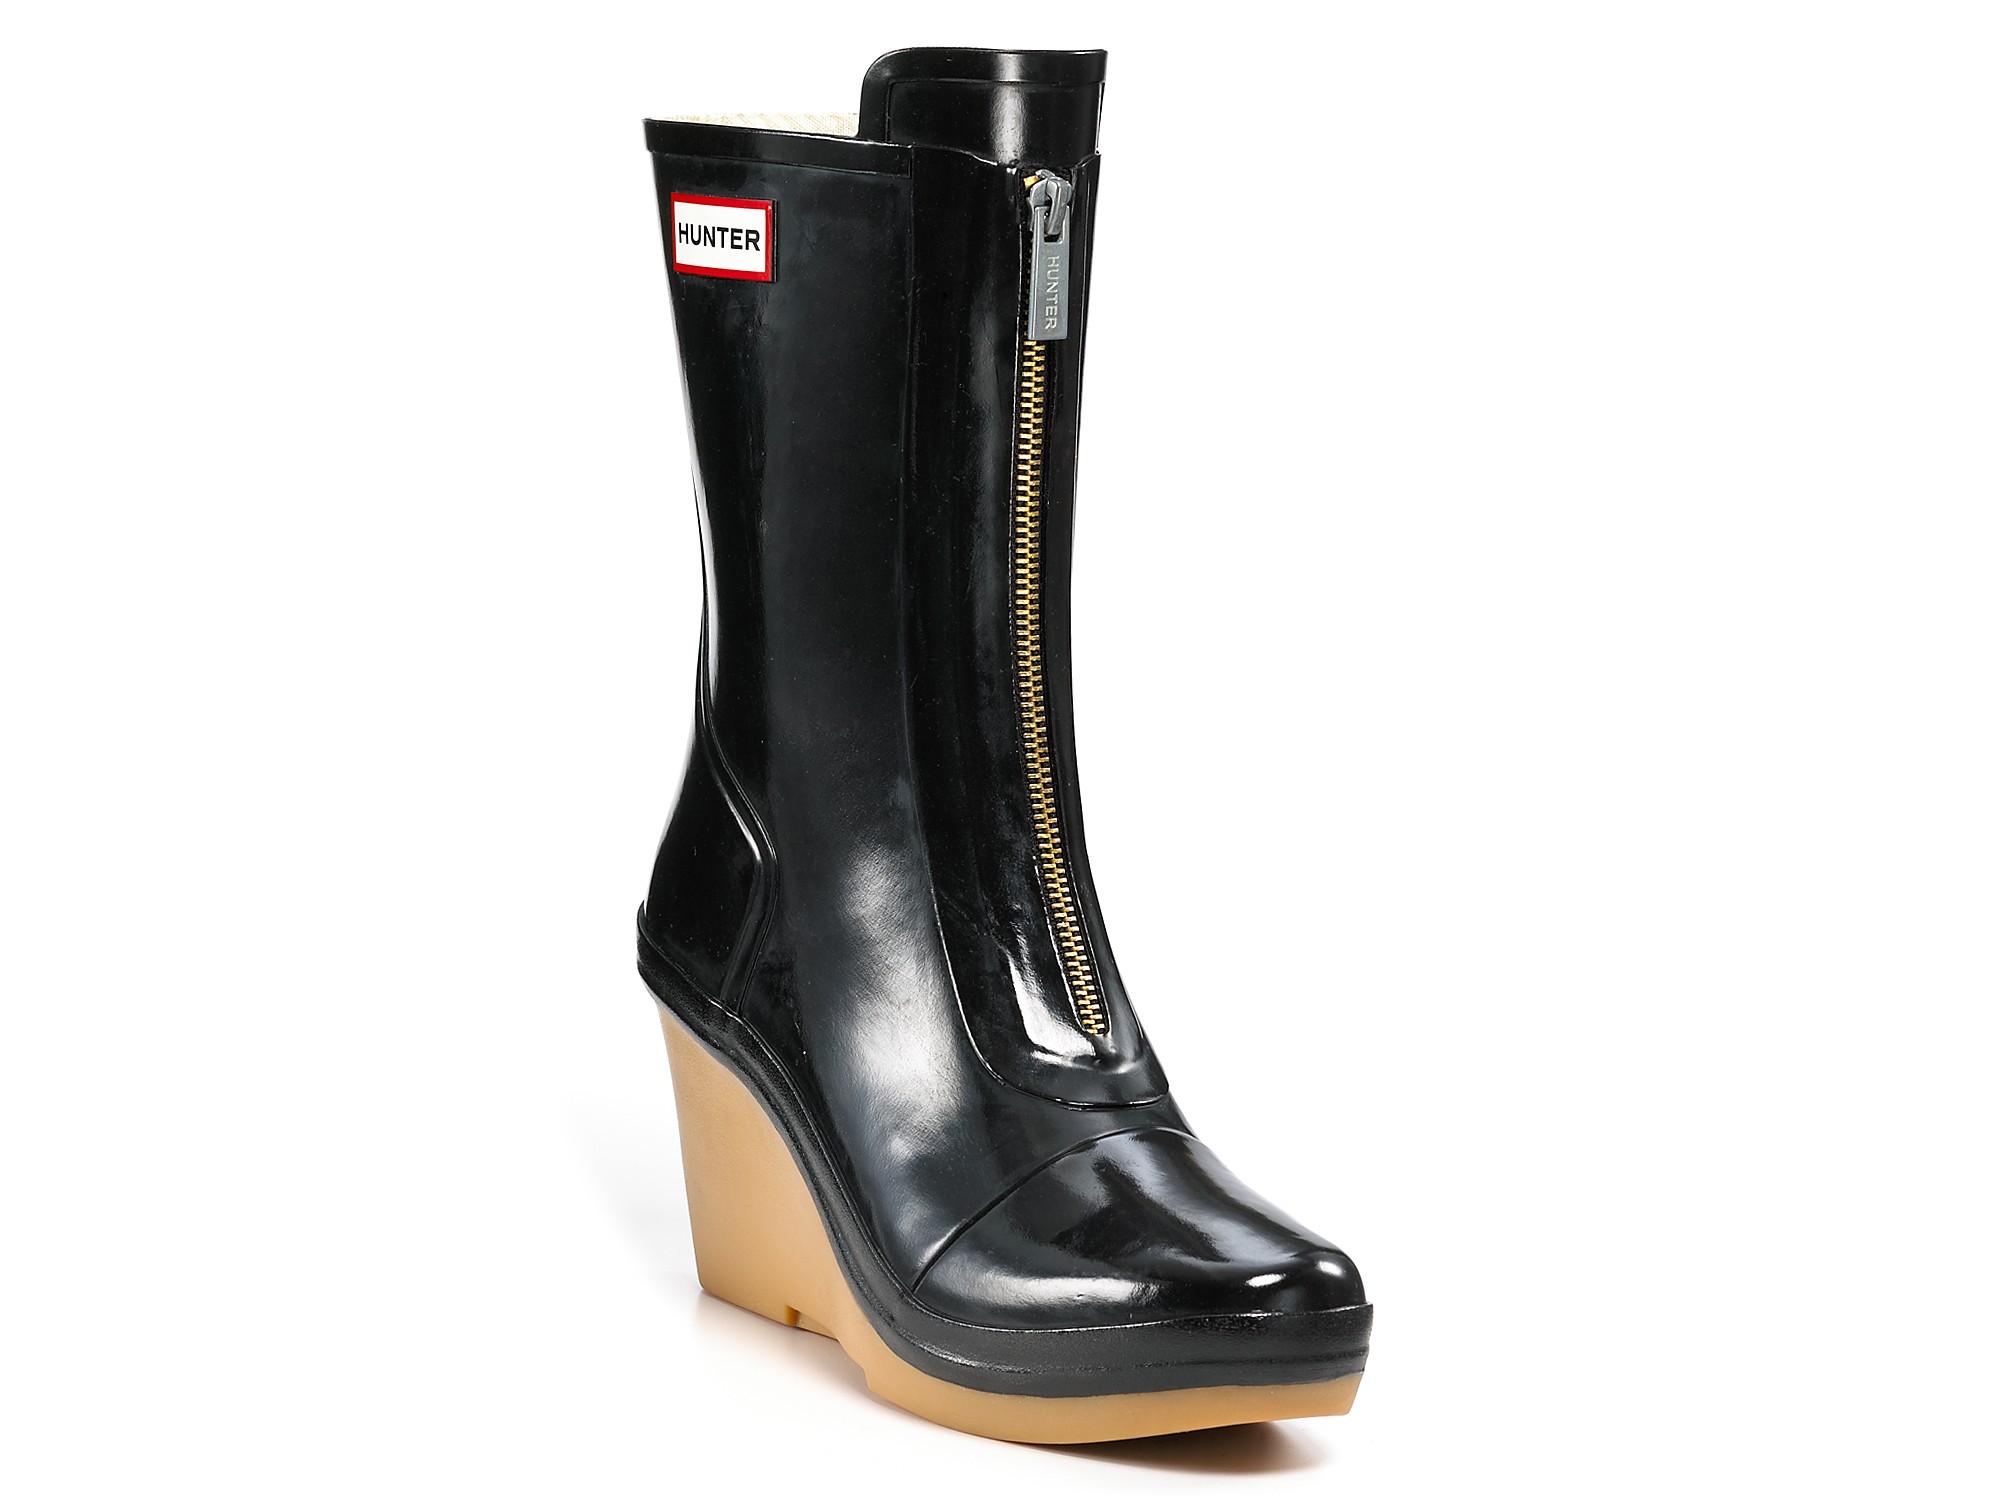 Hunter Rain Boots Miles Gloss Wedge In Black - Lyst